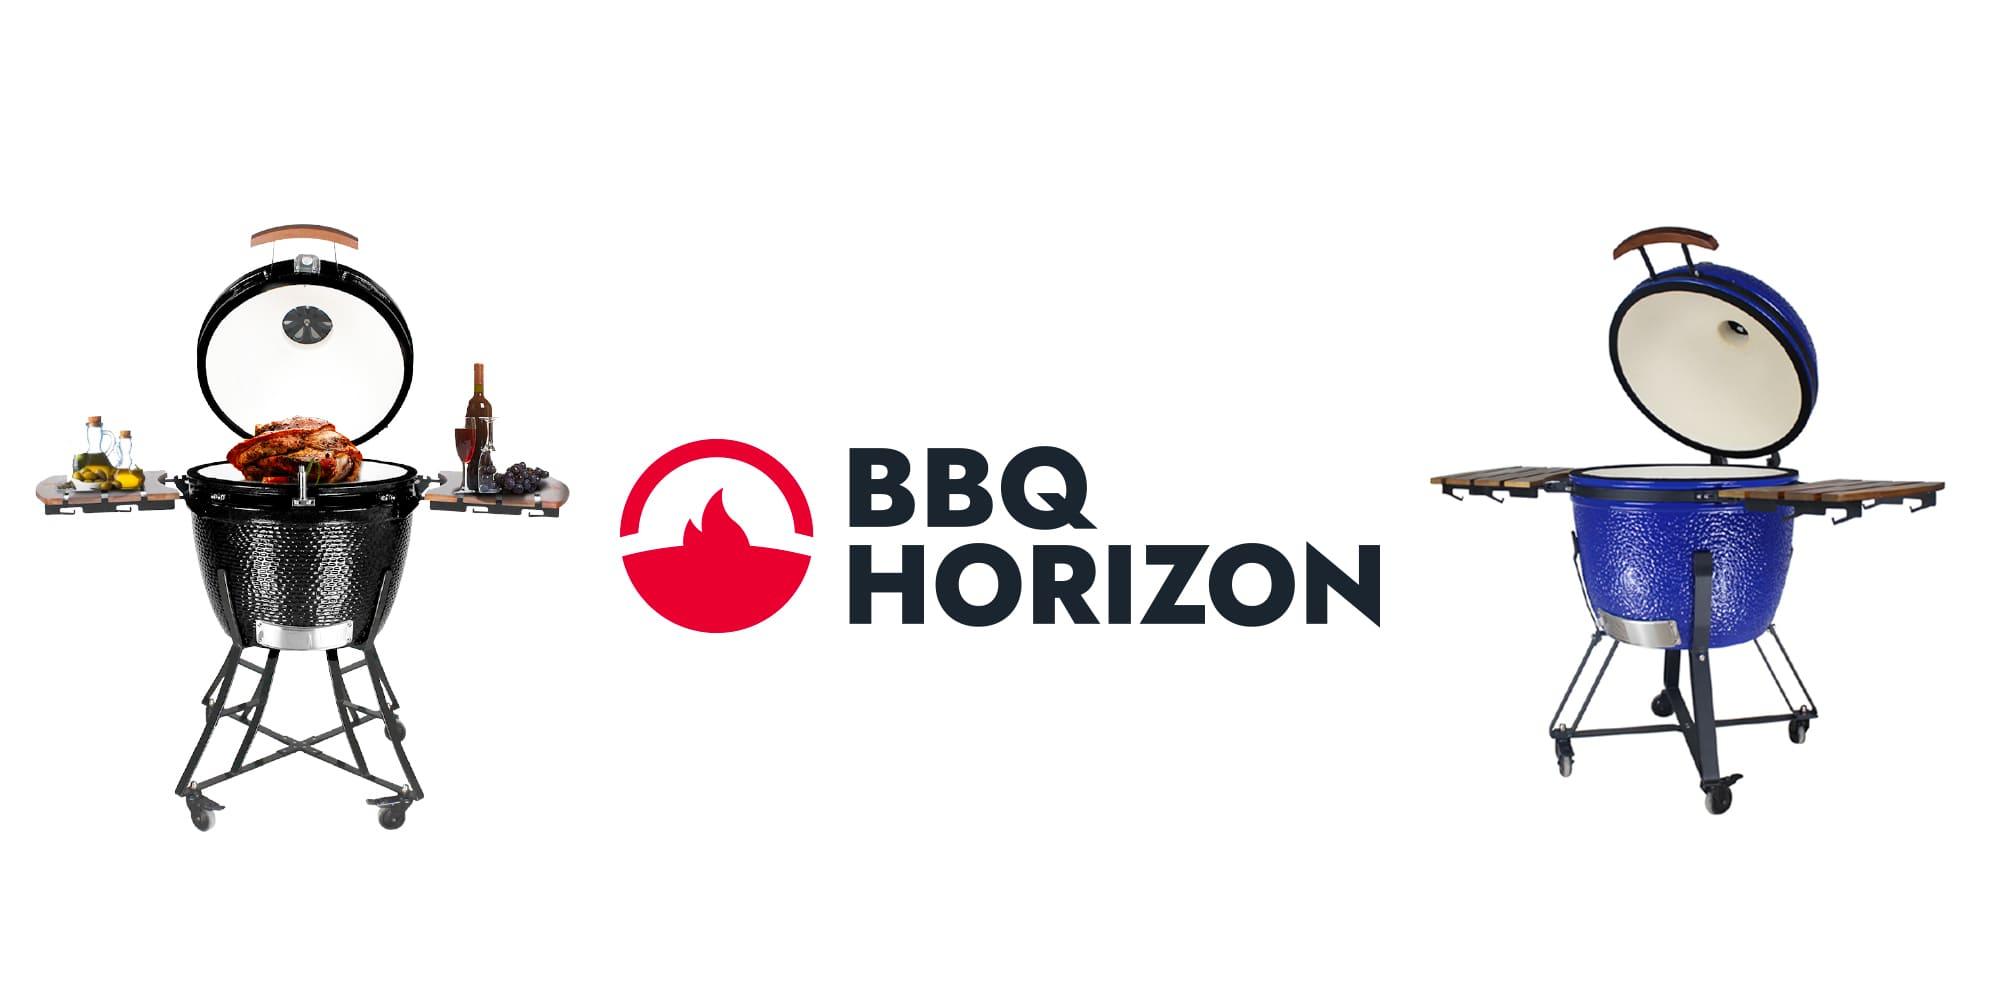 BBQ HORIZON cover 2 - stilographico